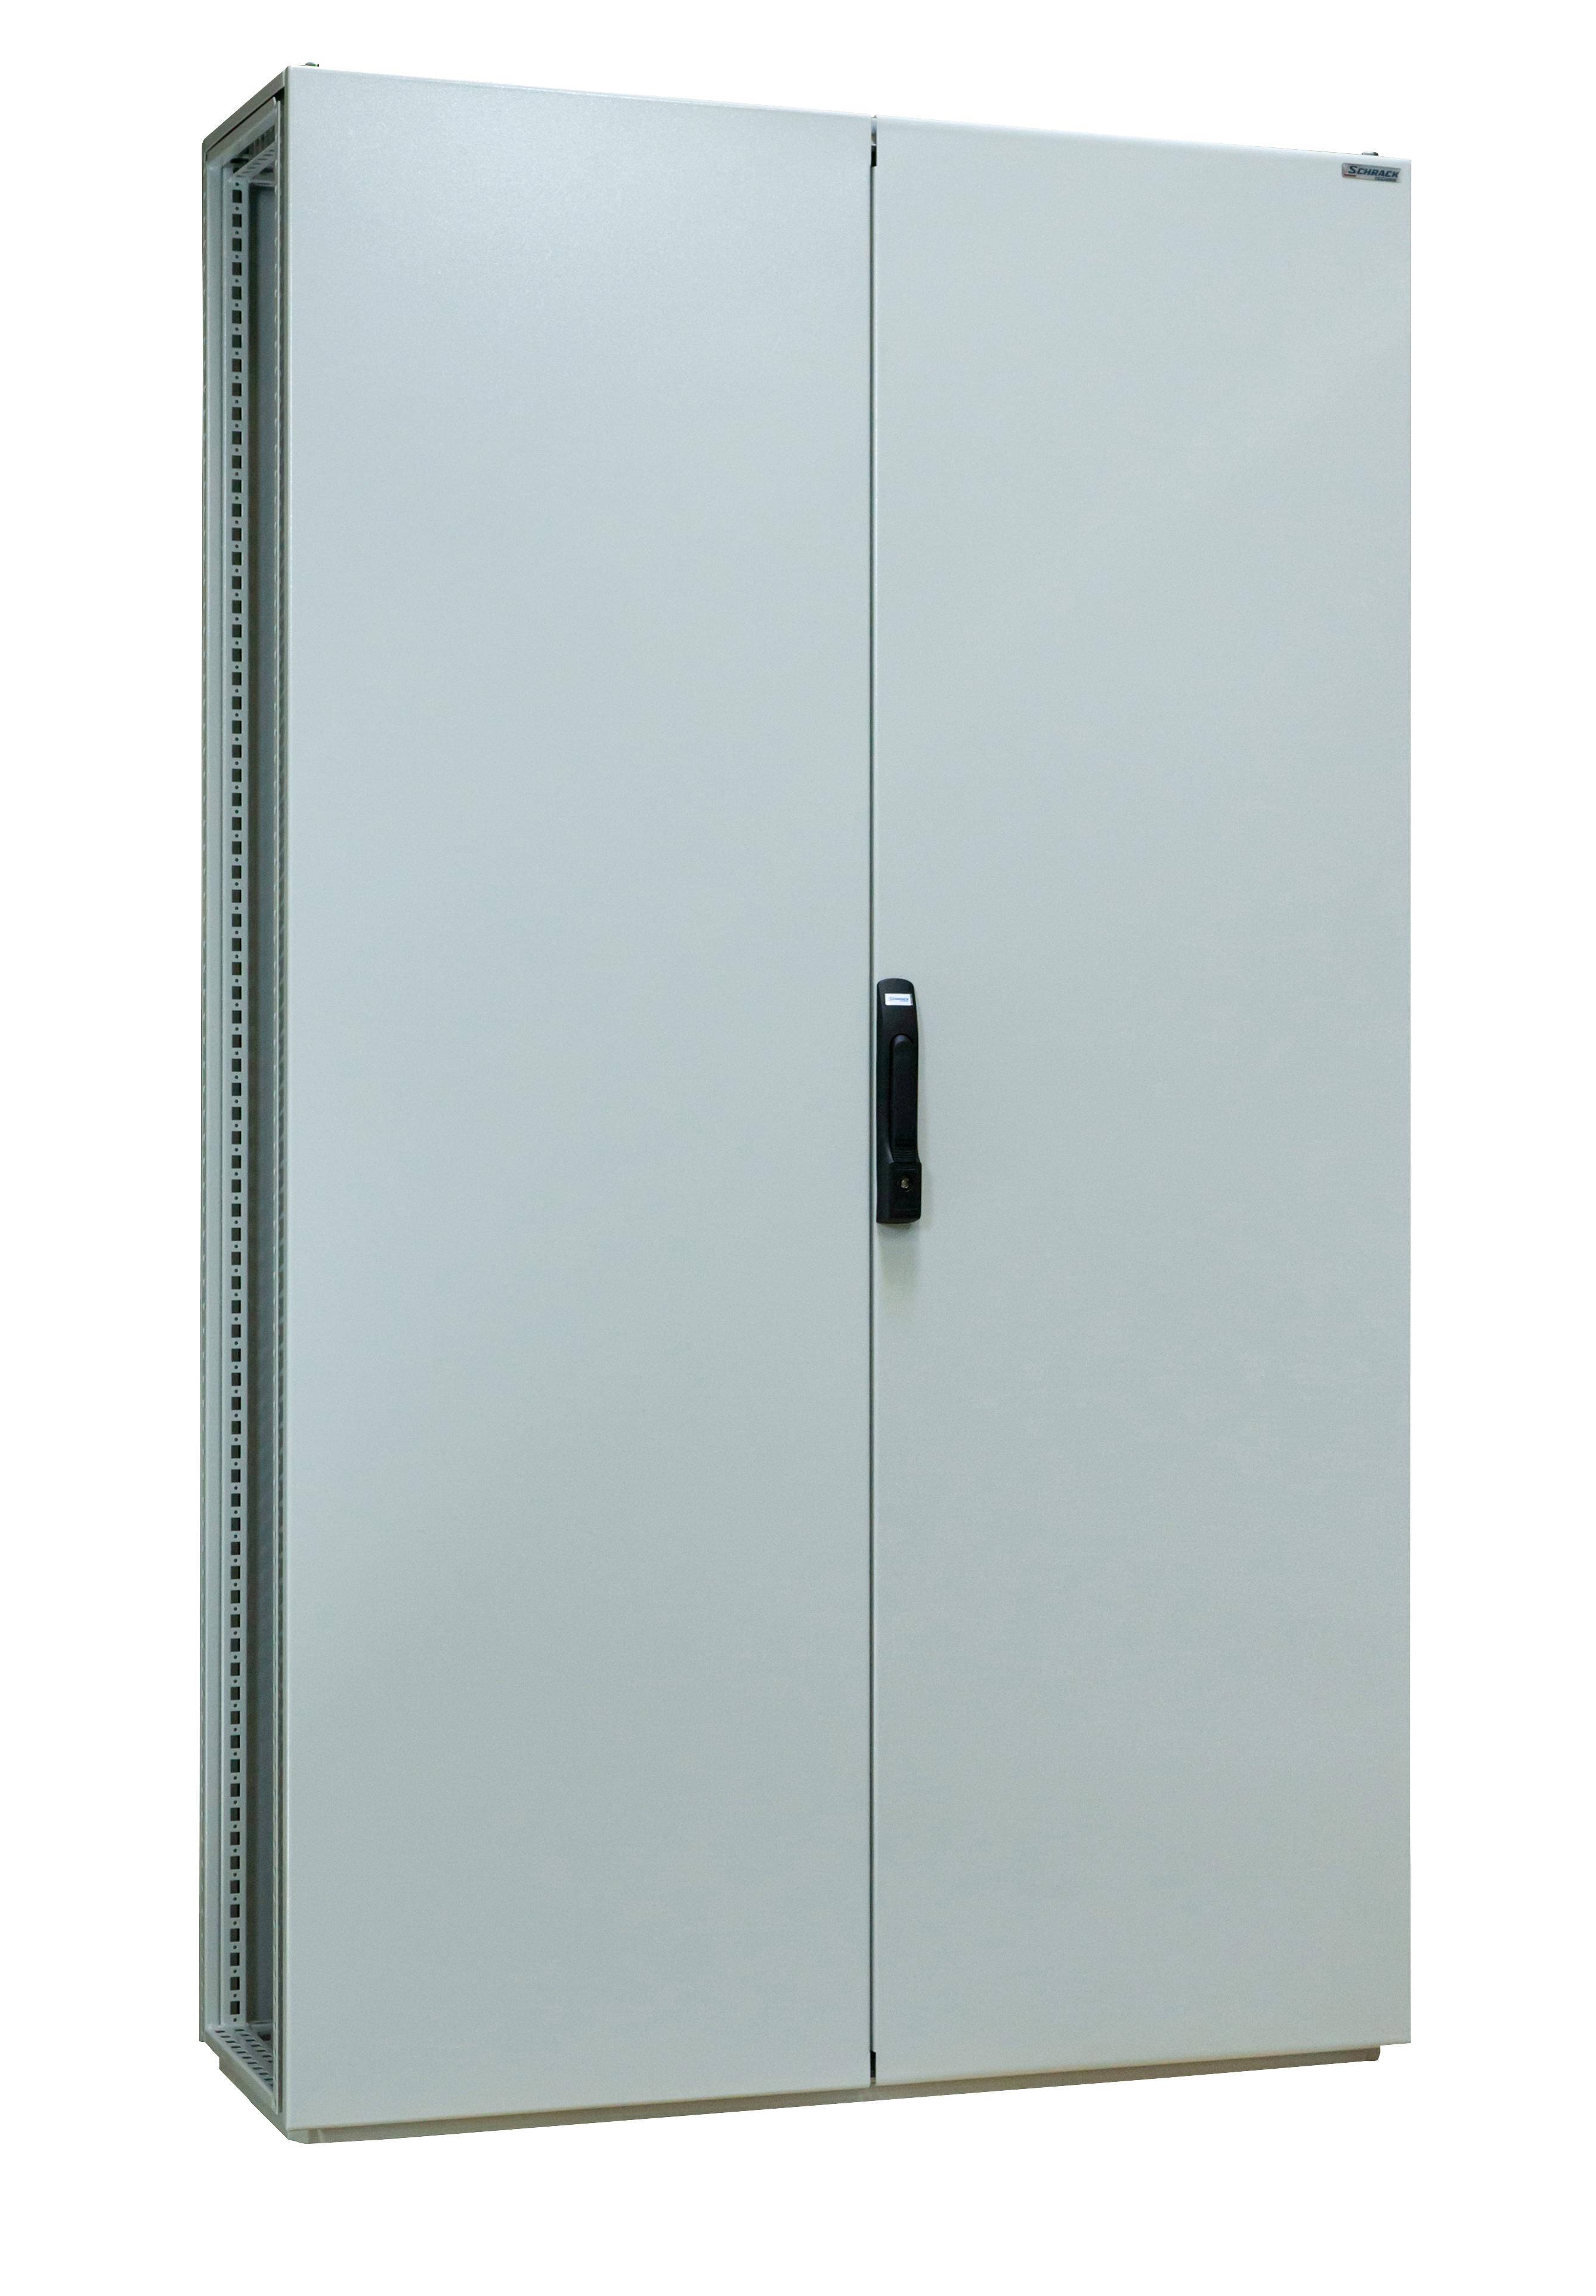 1 Stk Anreihschrank 2-türig 2000x1000x500mm, RAL 7035 AS201052-5